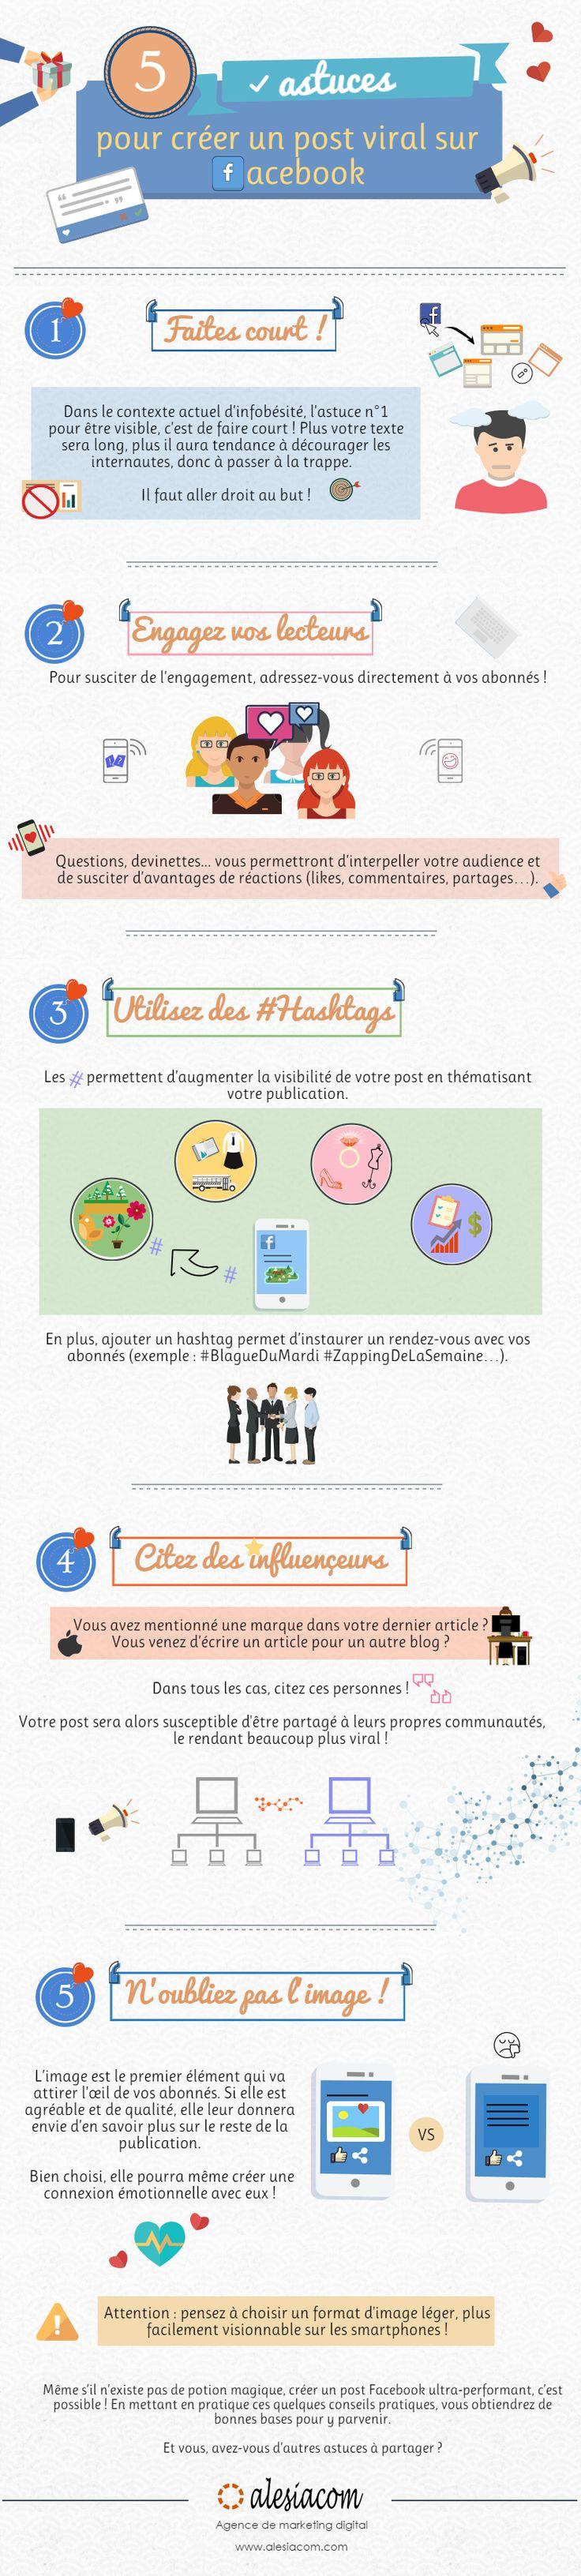 5 astuces pour créer un post viral sur Facebook | #Infographie  #SocialMedia #Facebook